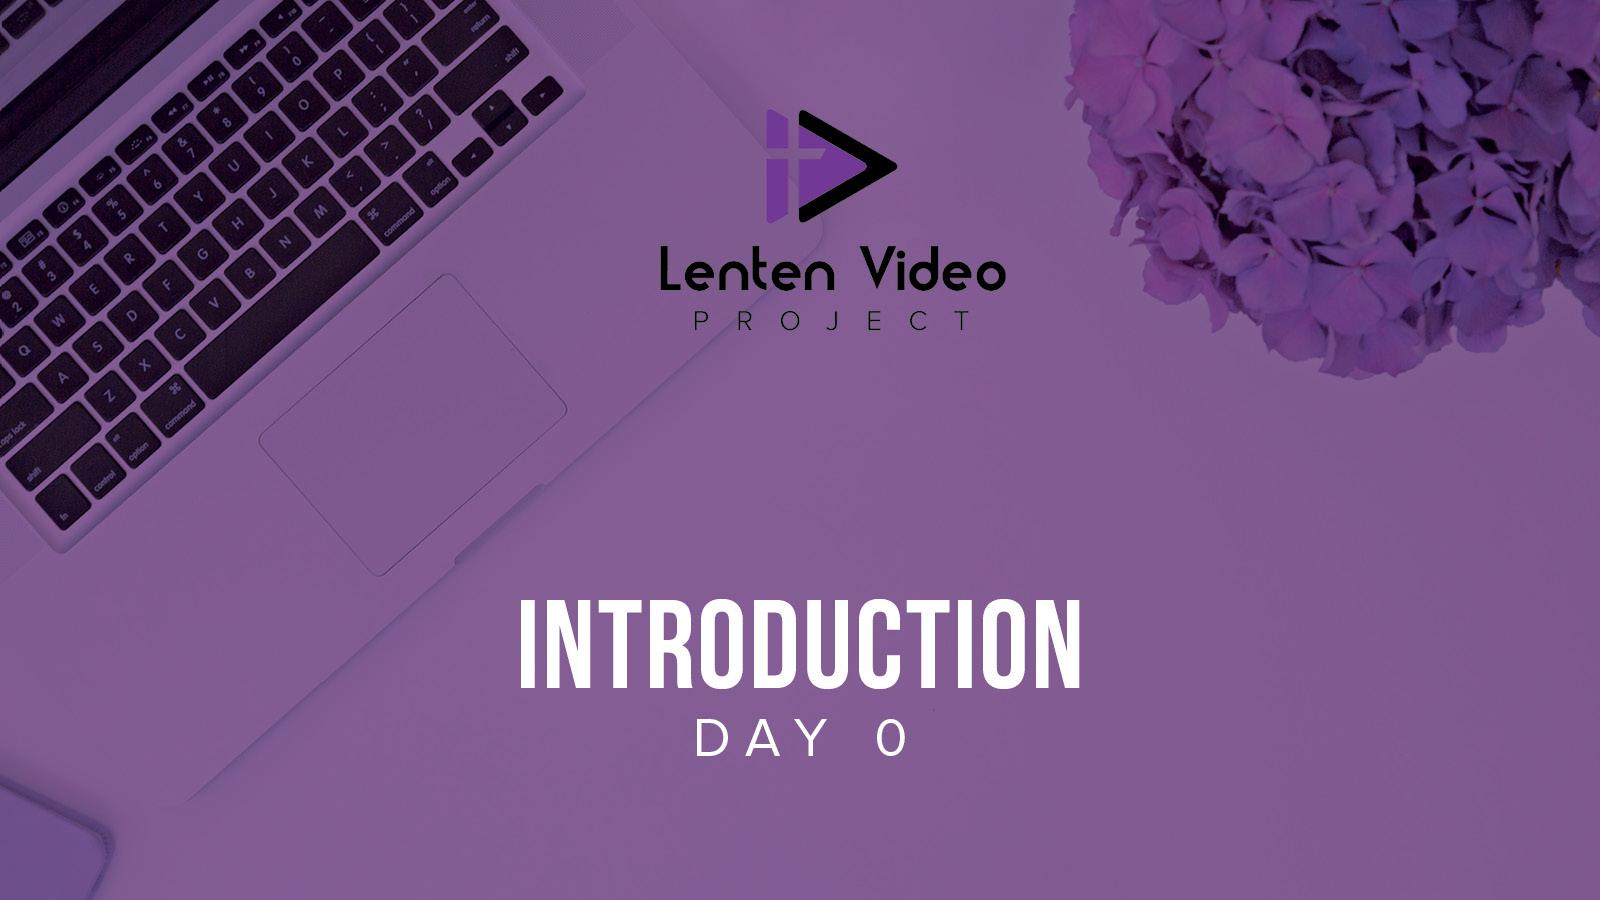 LVP Introduction